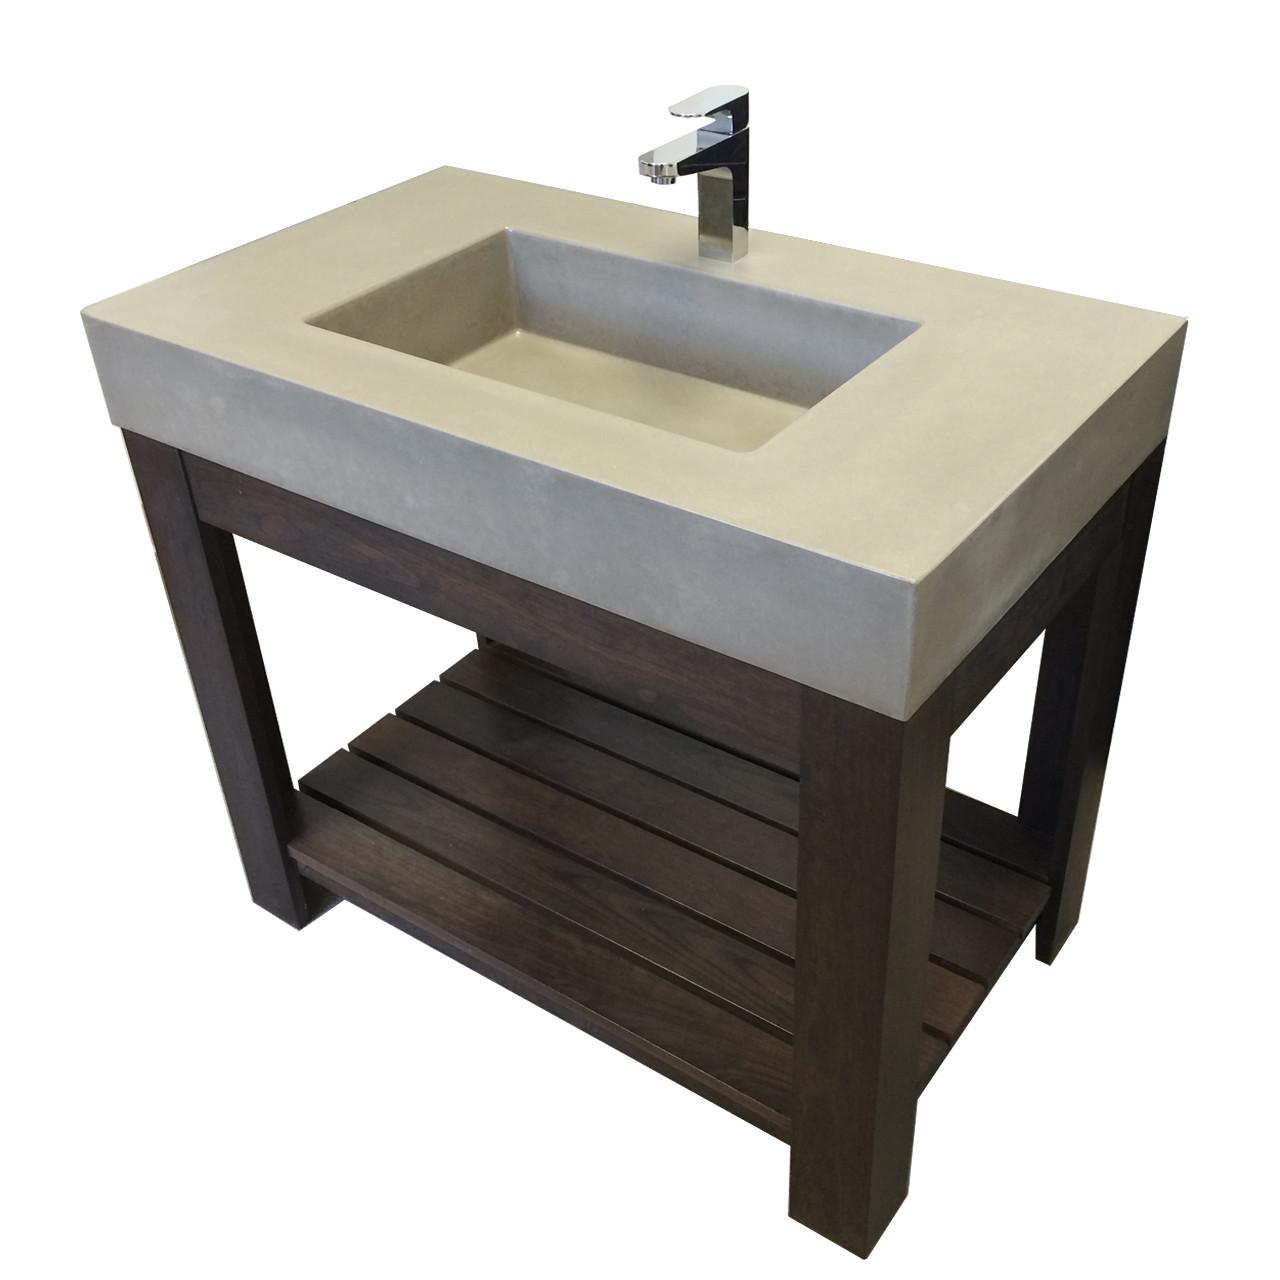 36 lavare vanity with concrete rectangle sink